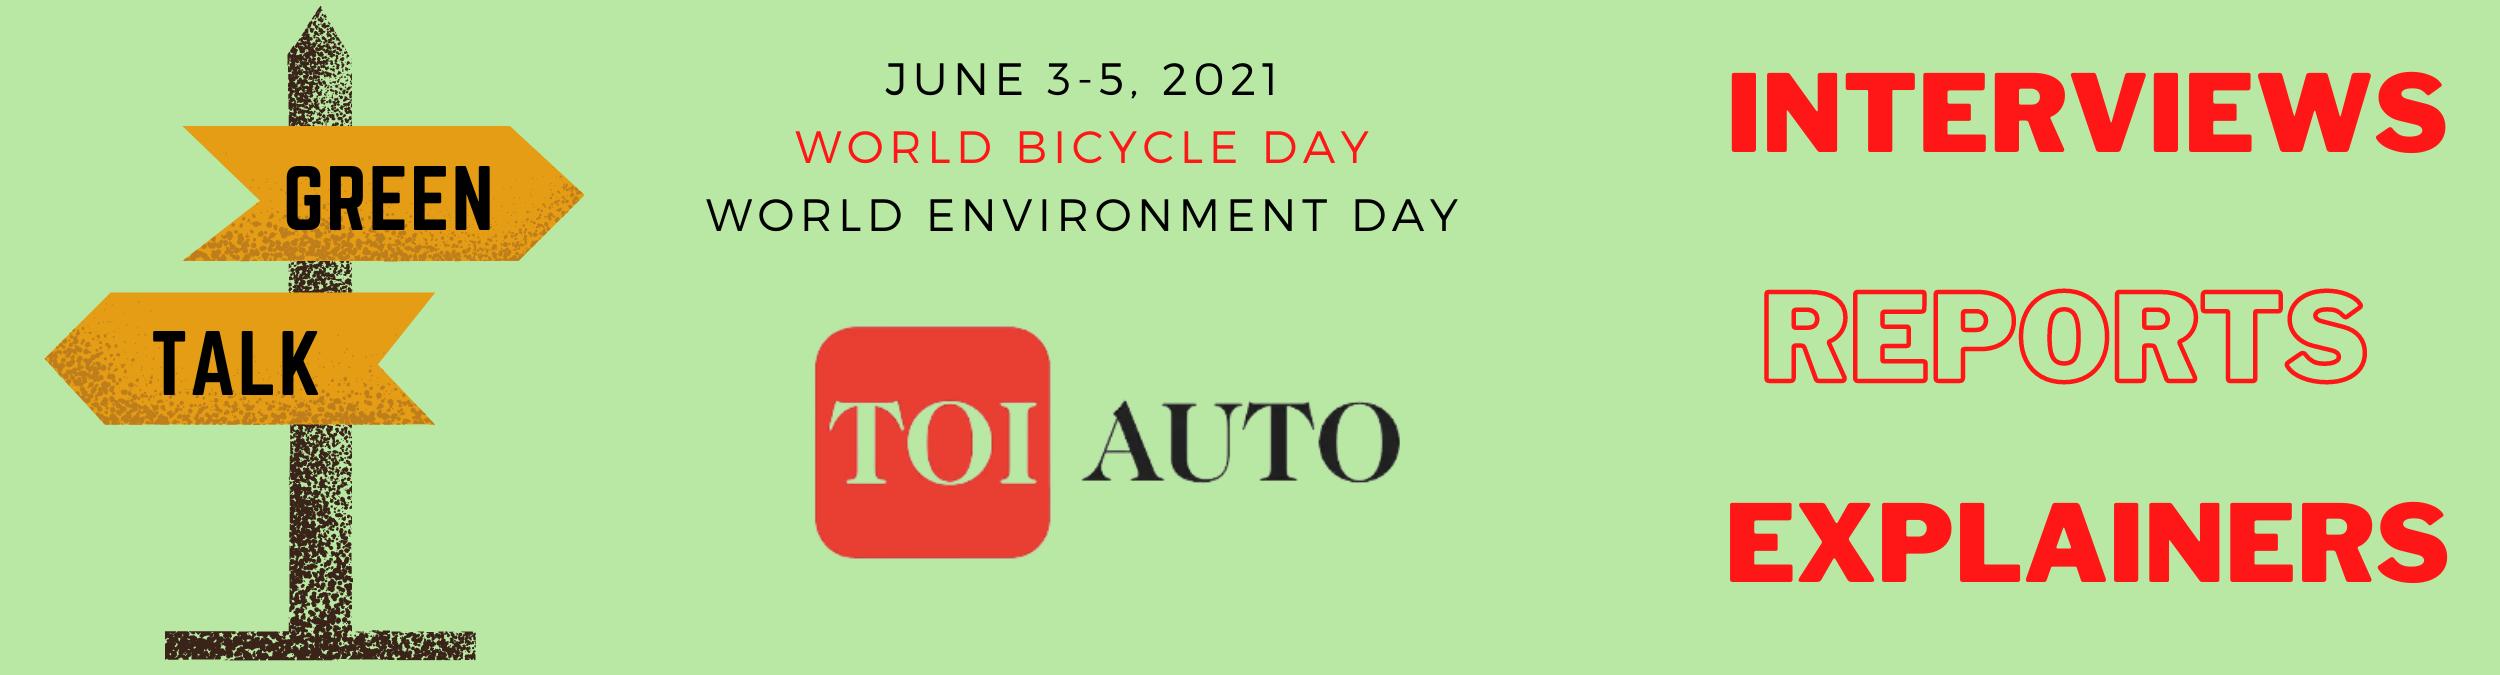 TOI Auto Green Talk: Electrifying mobility will support national goals, says Toyota's Gulati – ET Auto